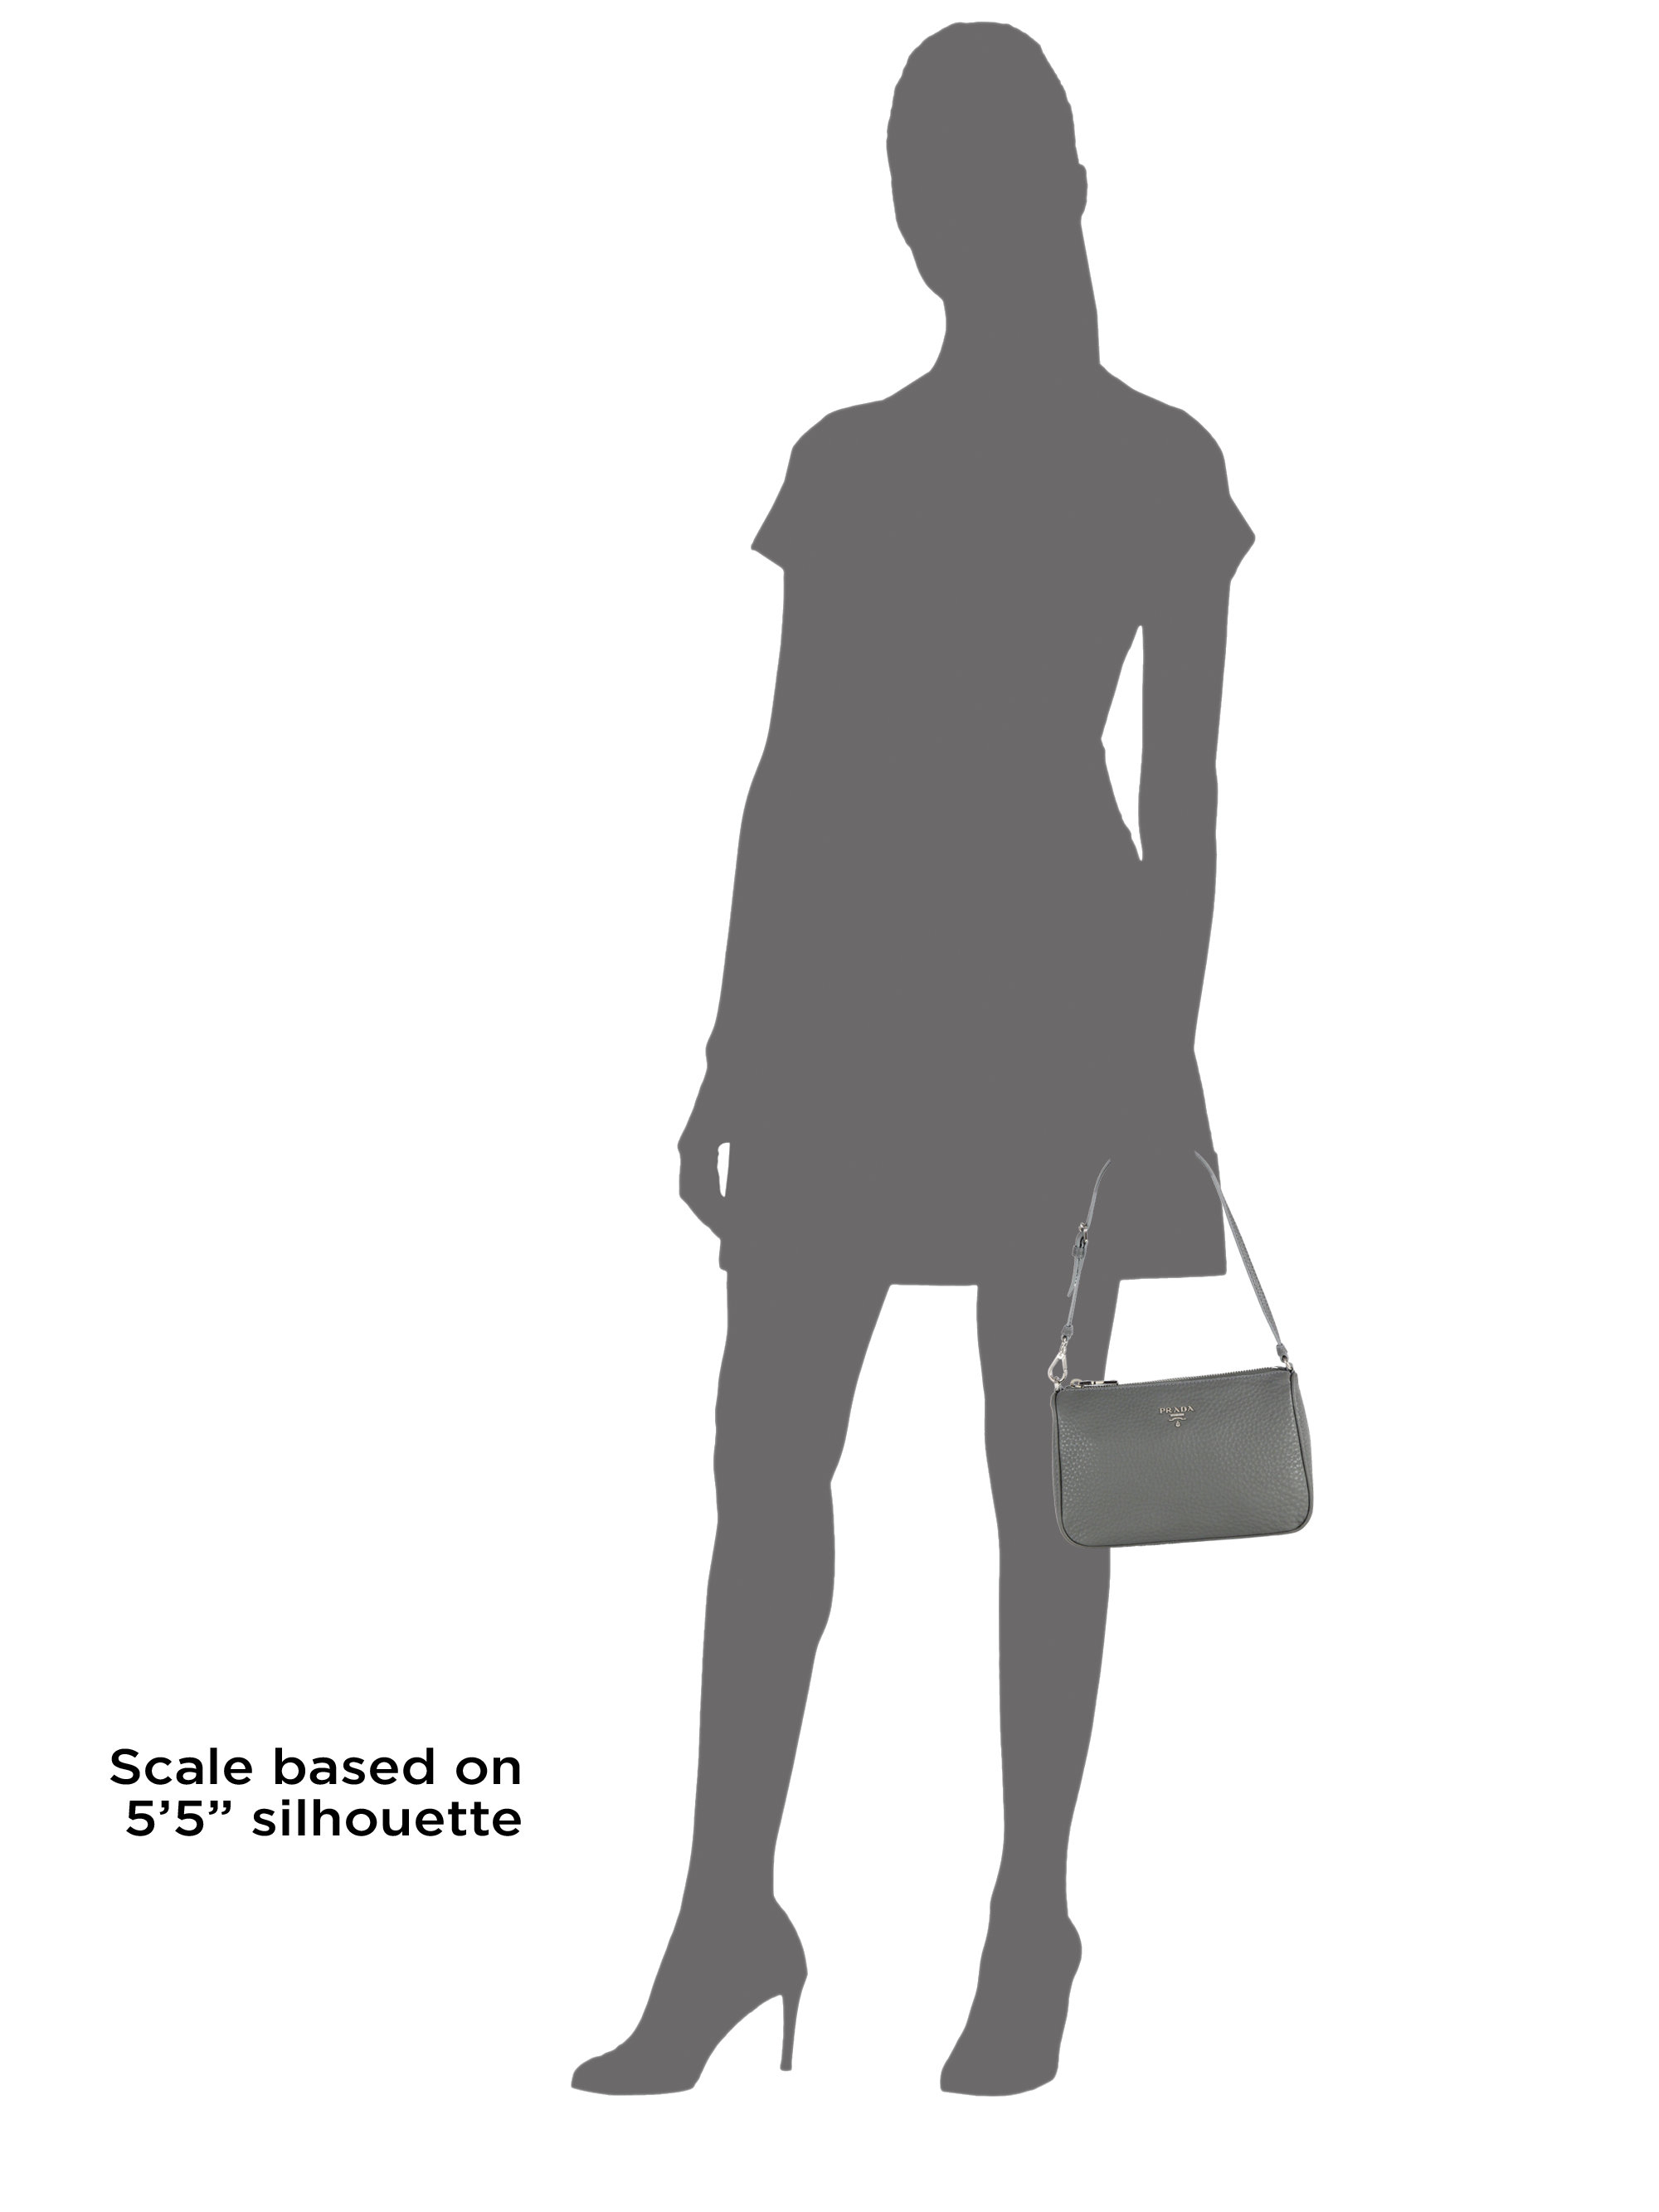 prada saffiano satchel bag - prada metallic satin hobo, prada navy blue handbag